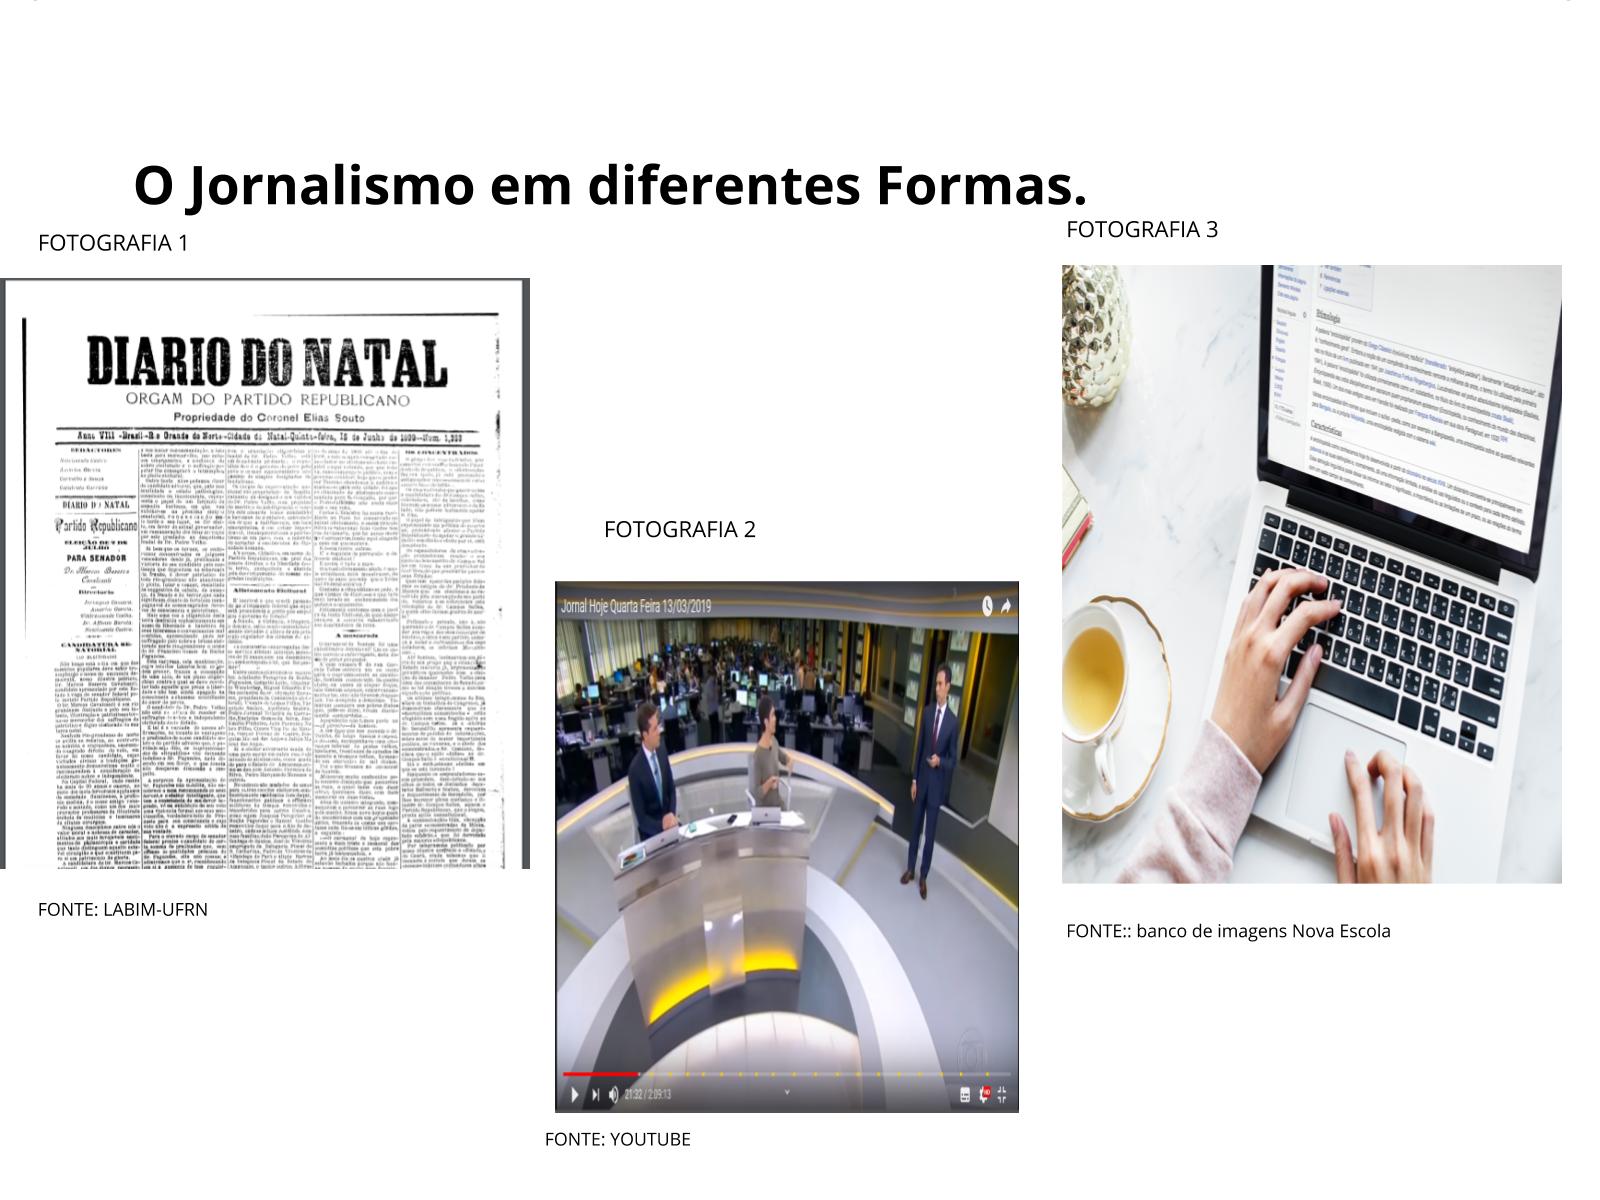 O Jornalismo